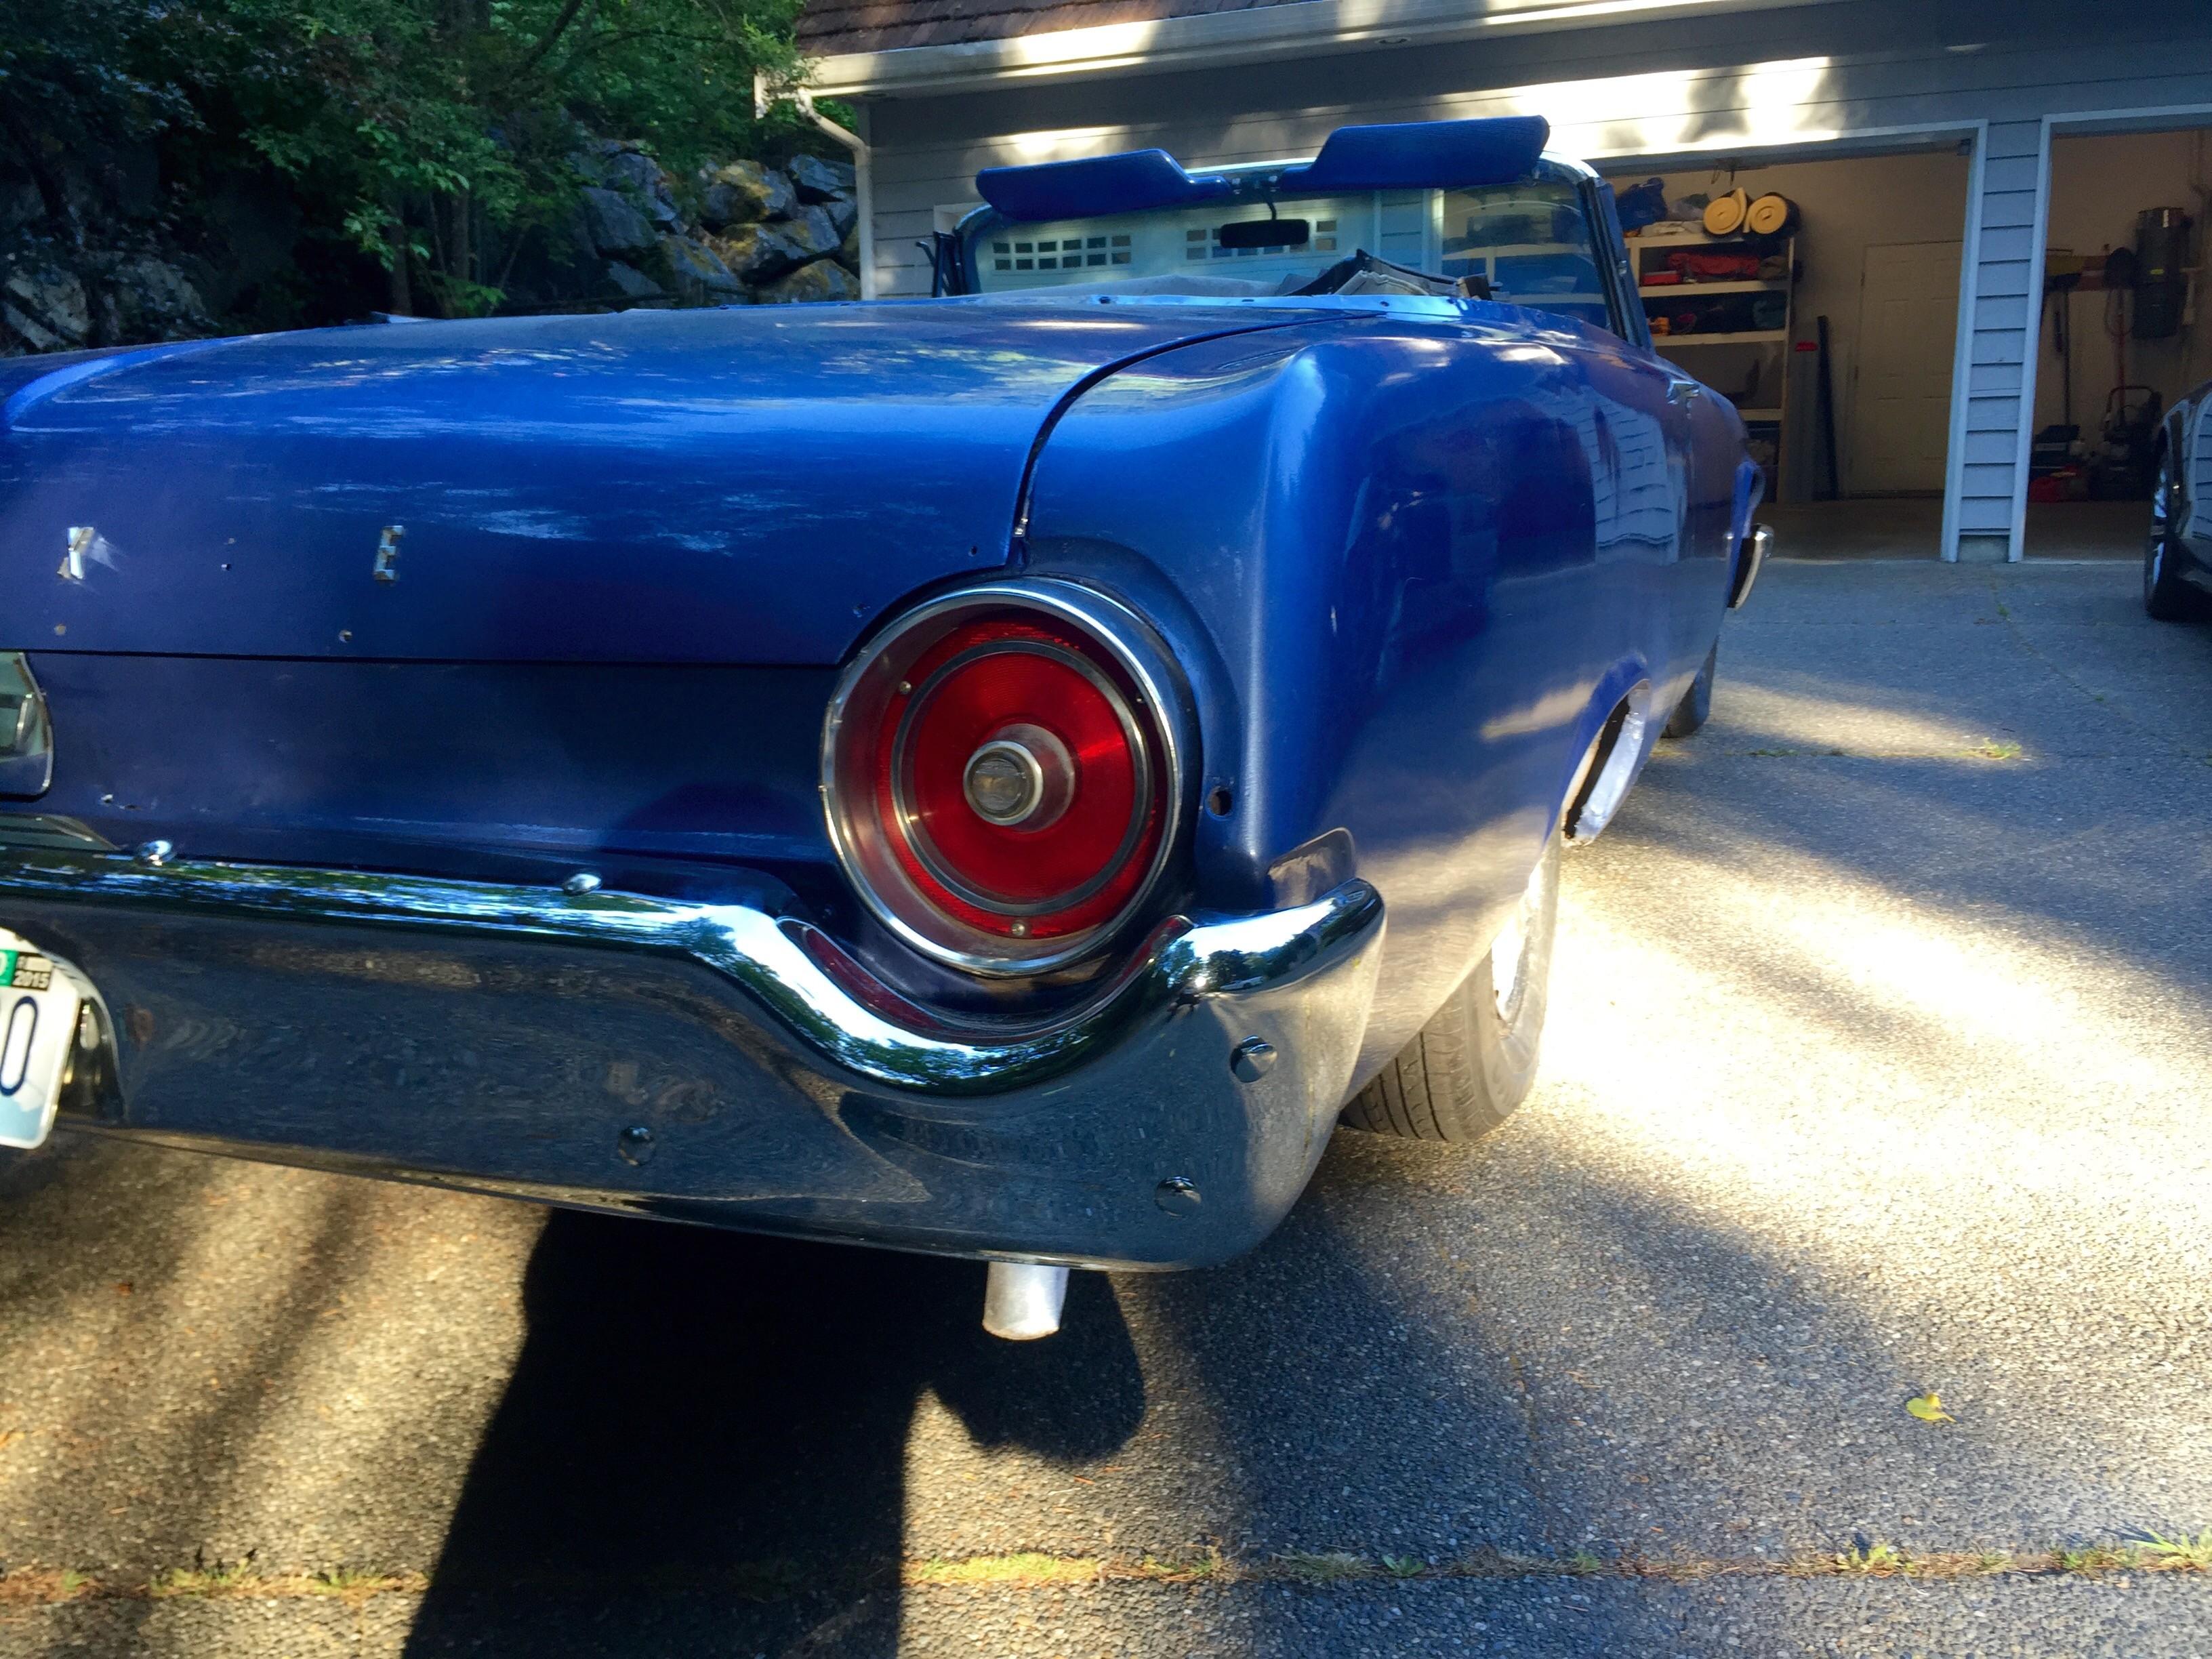 1962 Galaxie tail light